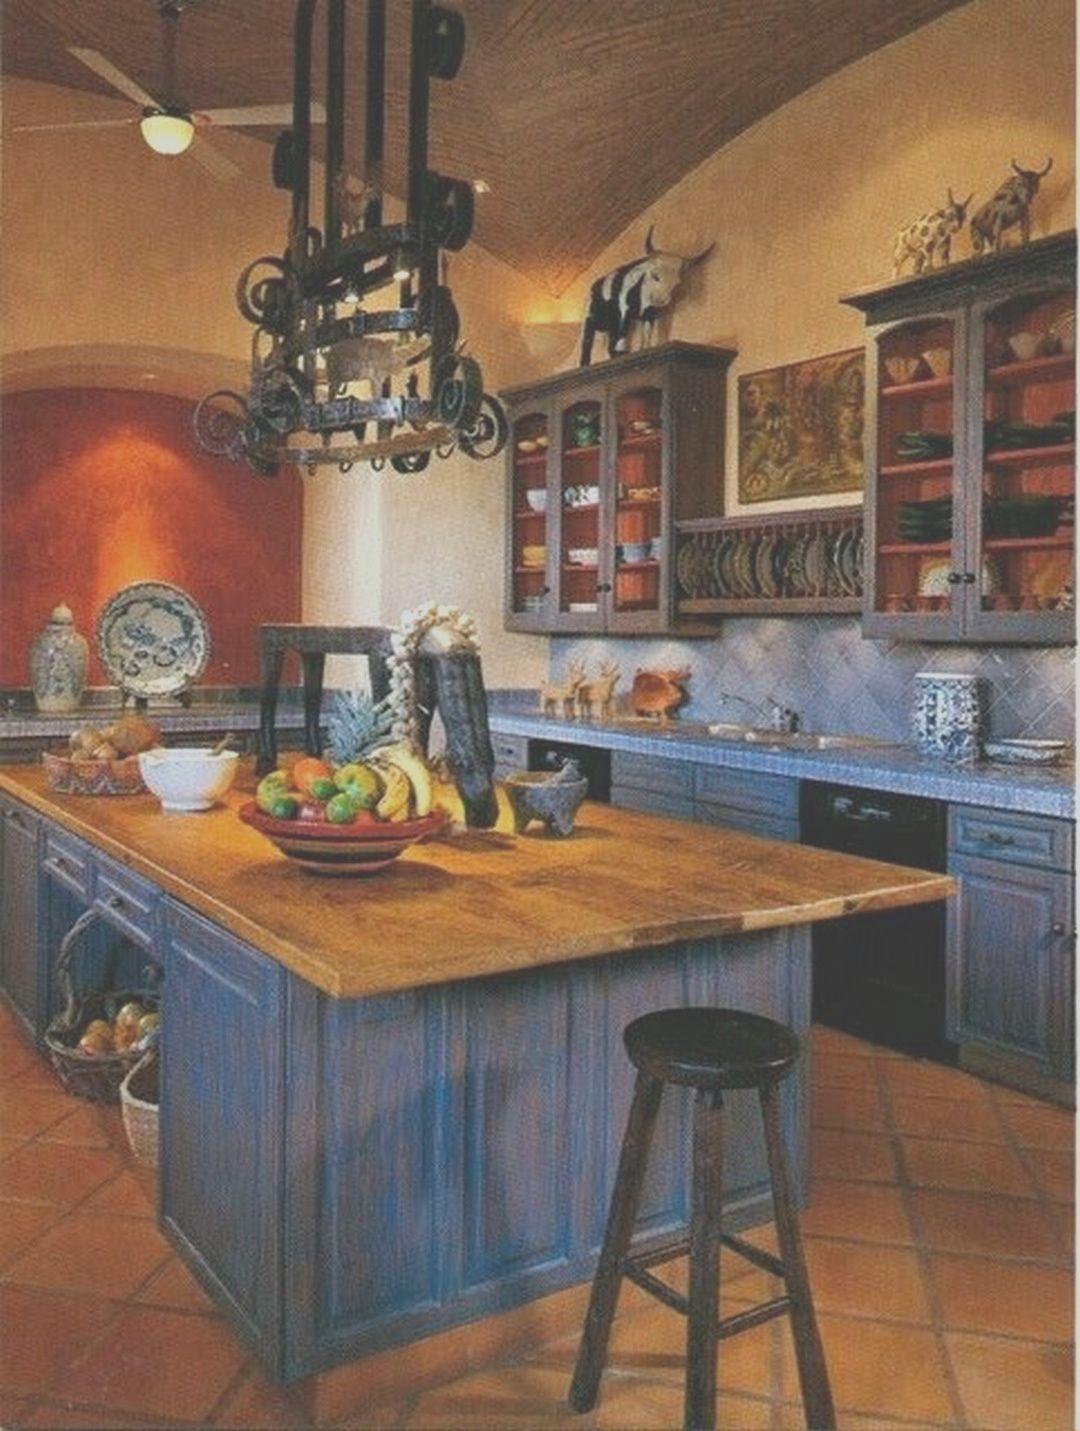 8 Fabulous Kitchen Mexican Decor Stock In 2020 Mediterranean Kitchen Design Spanish Style Kitchen Mexican Kitchen Decor